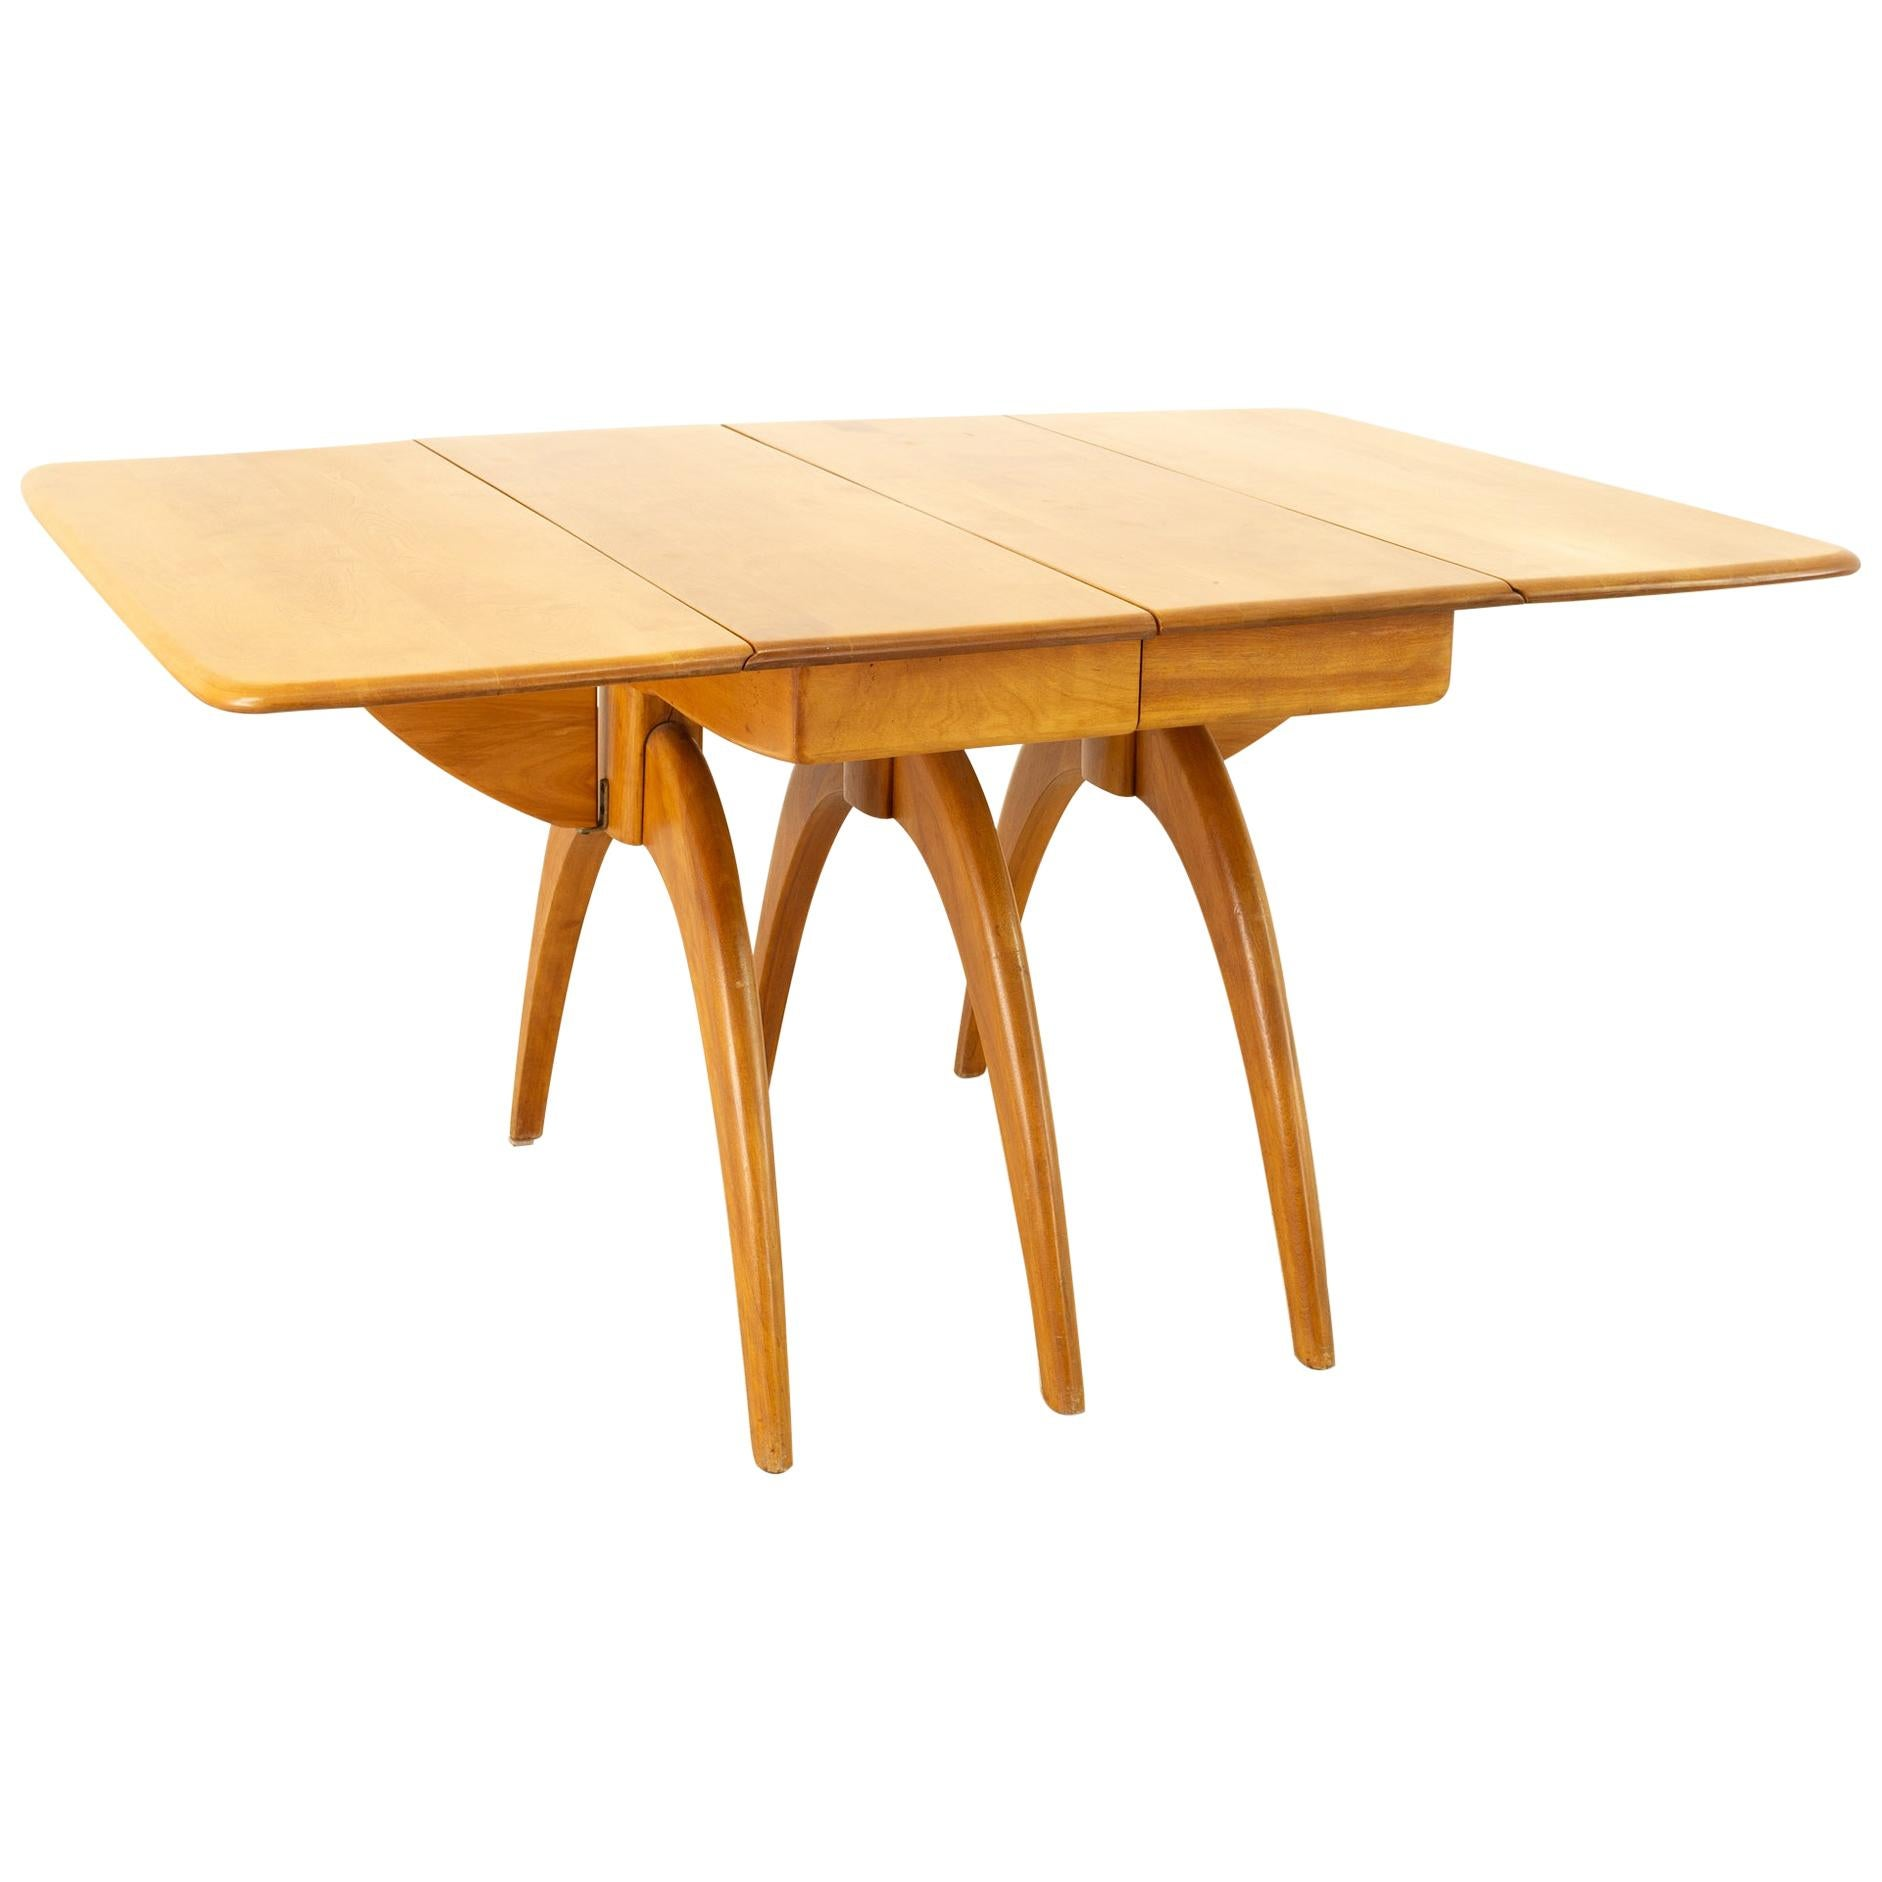 Heywood Wakefield Mid Century Maple Wishbone Expanding Dining Table